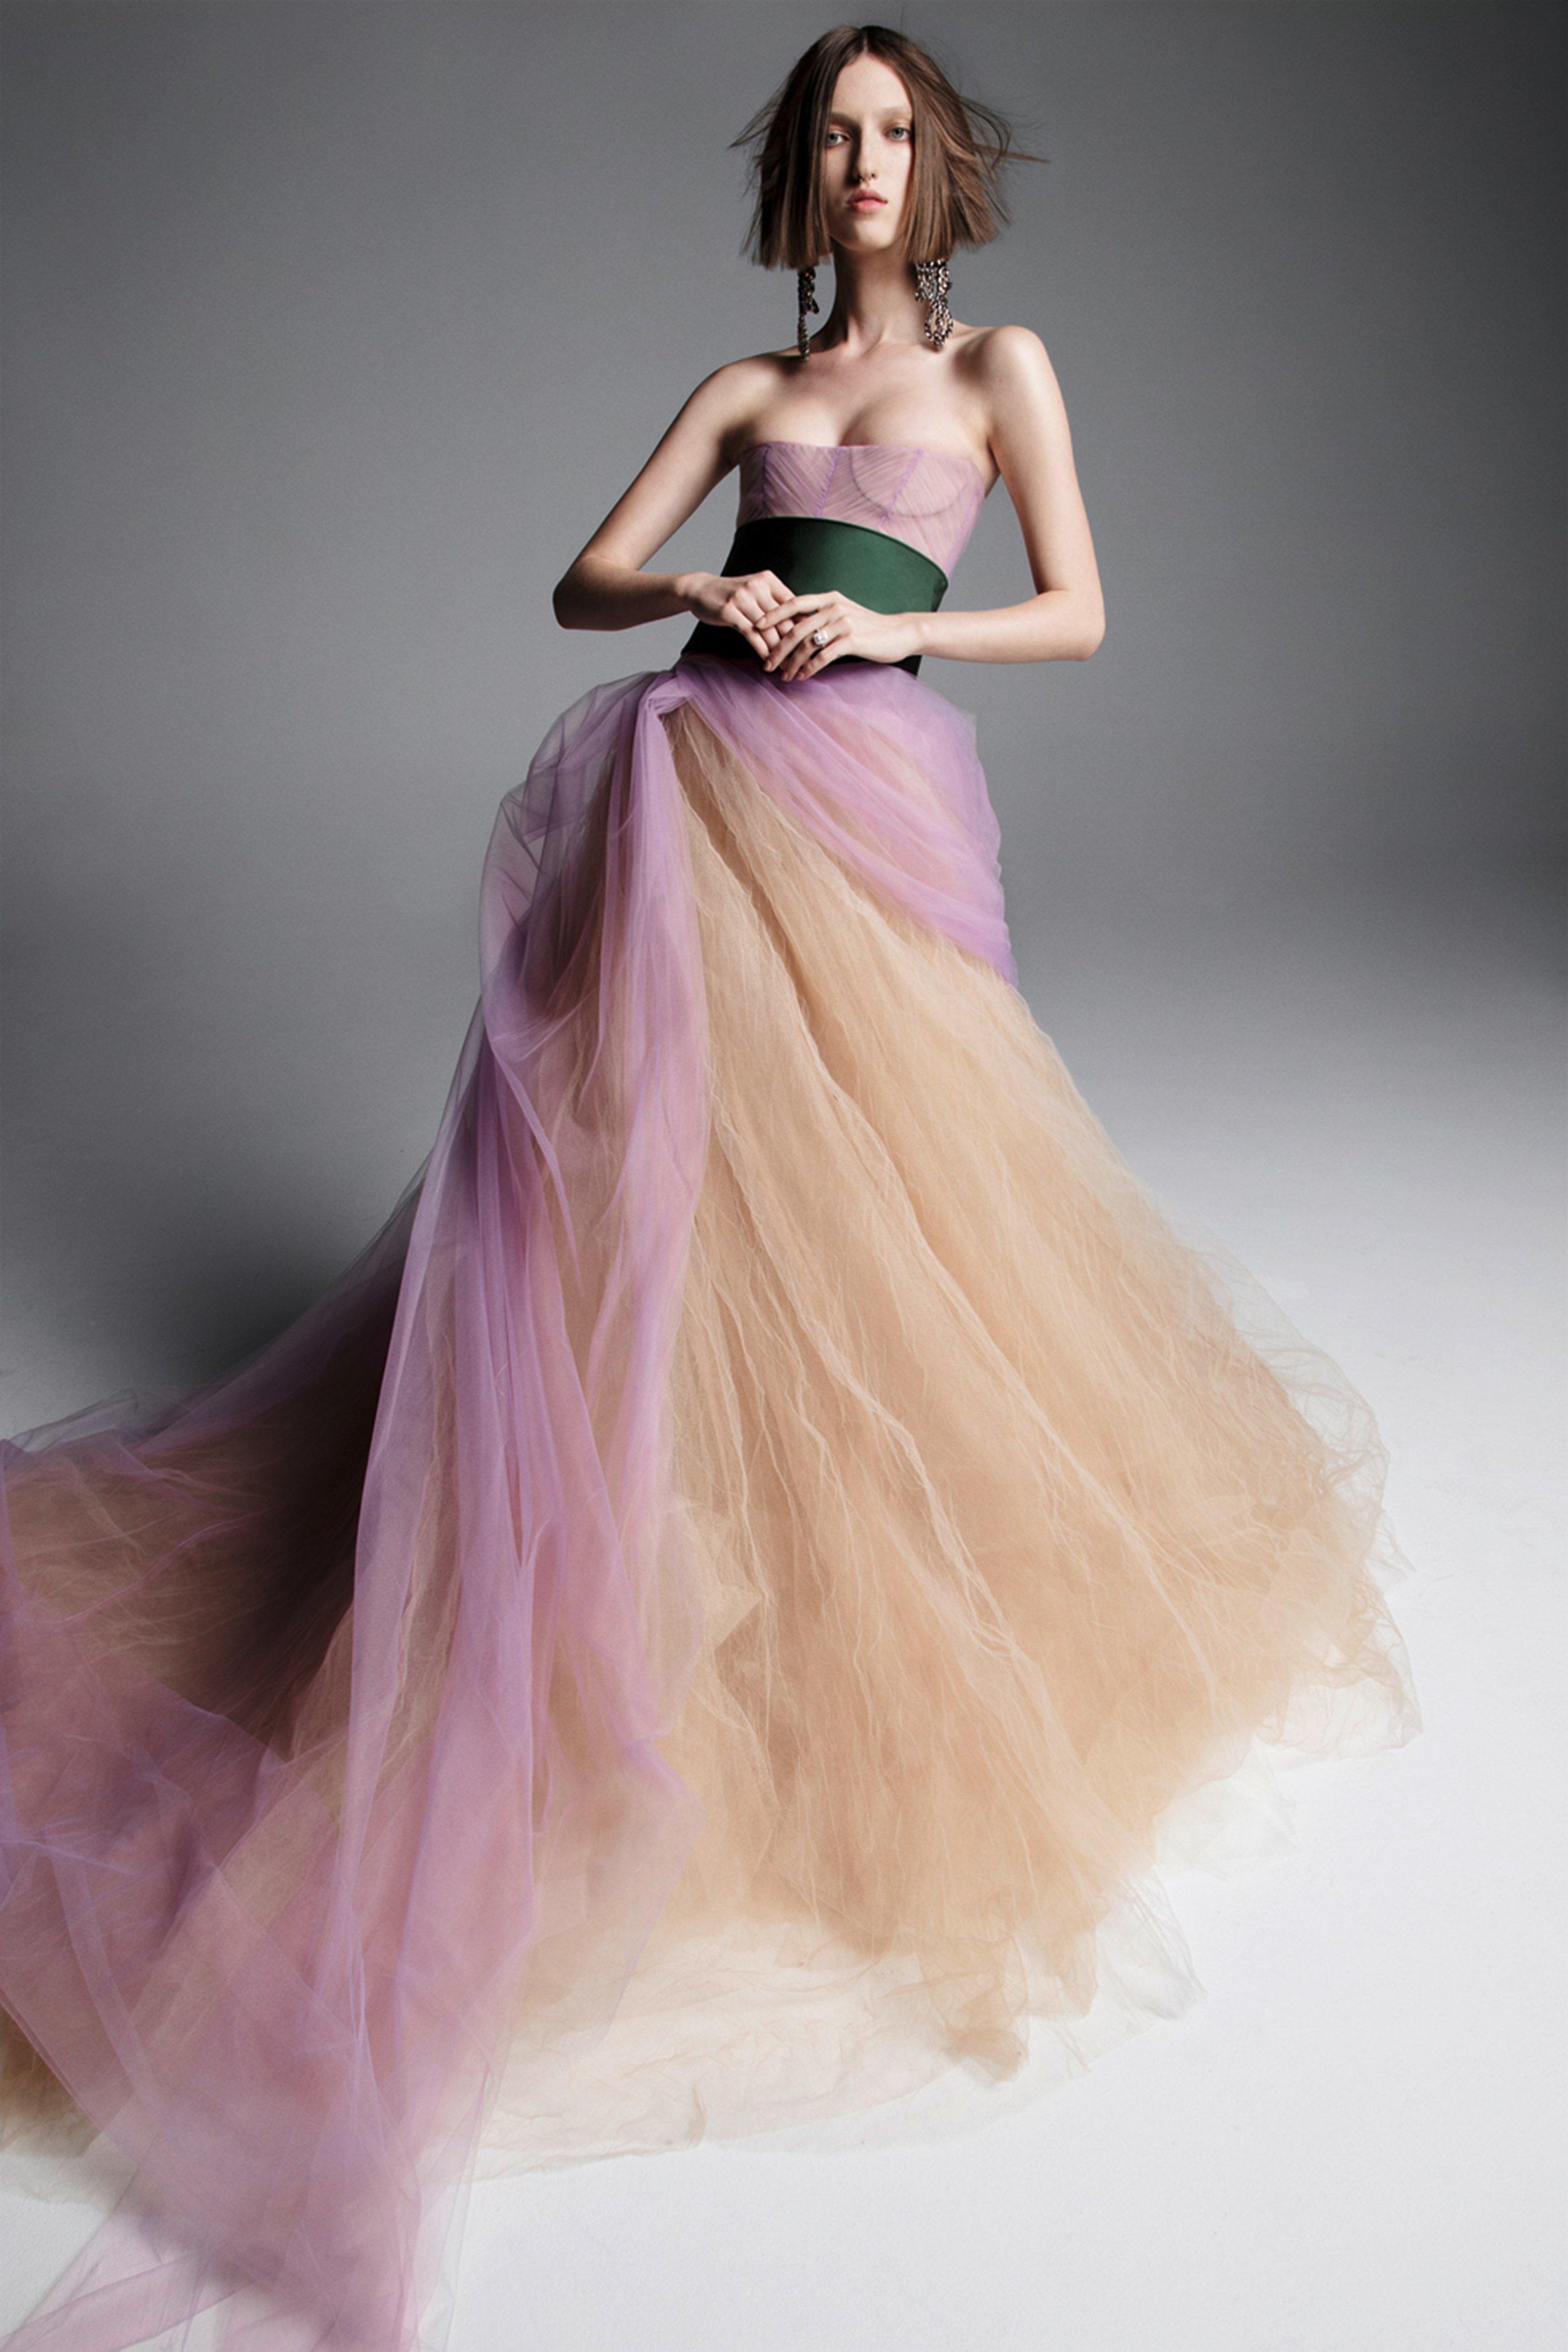 ALEXANDRA-vera-wang-bridal-spring-2019.jpg